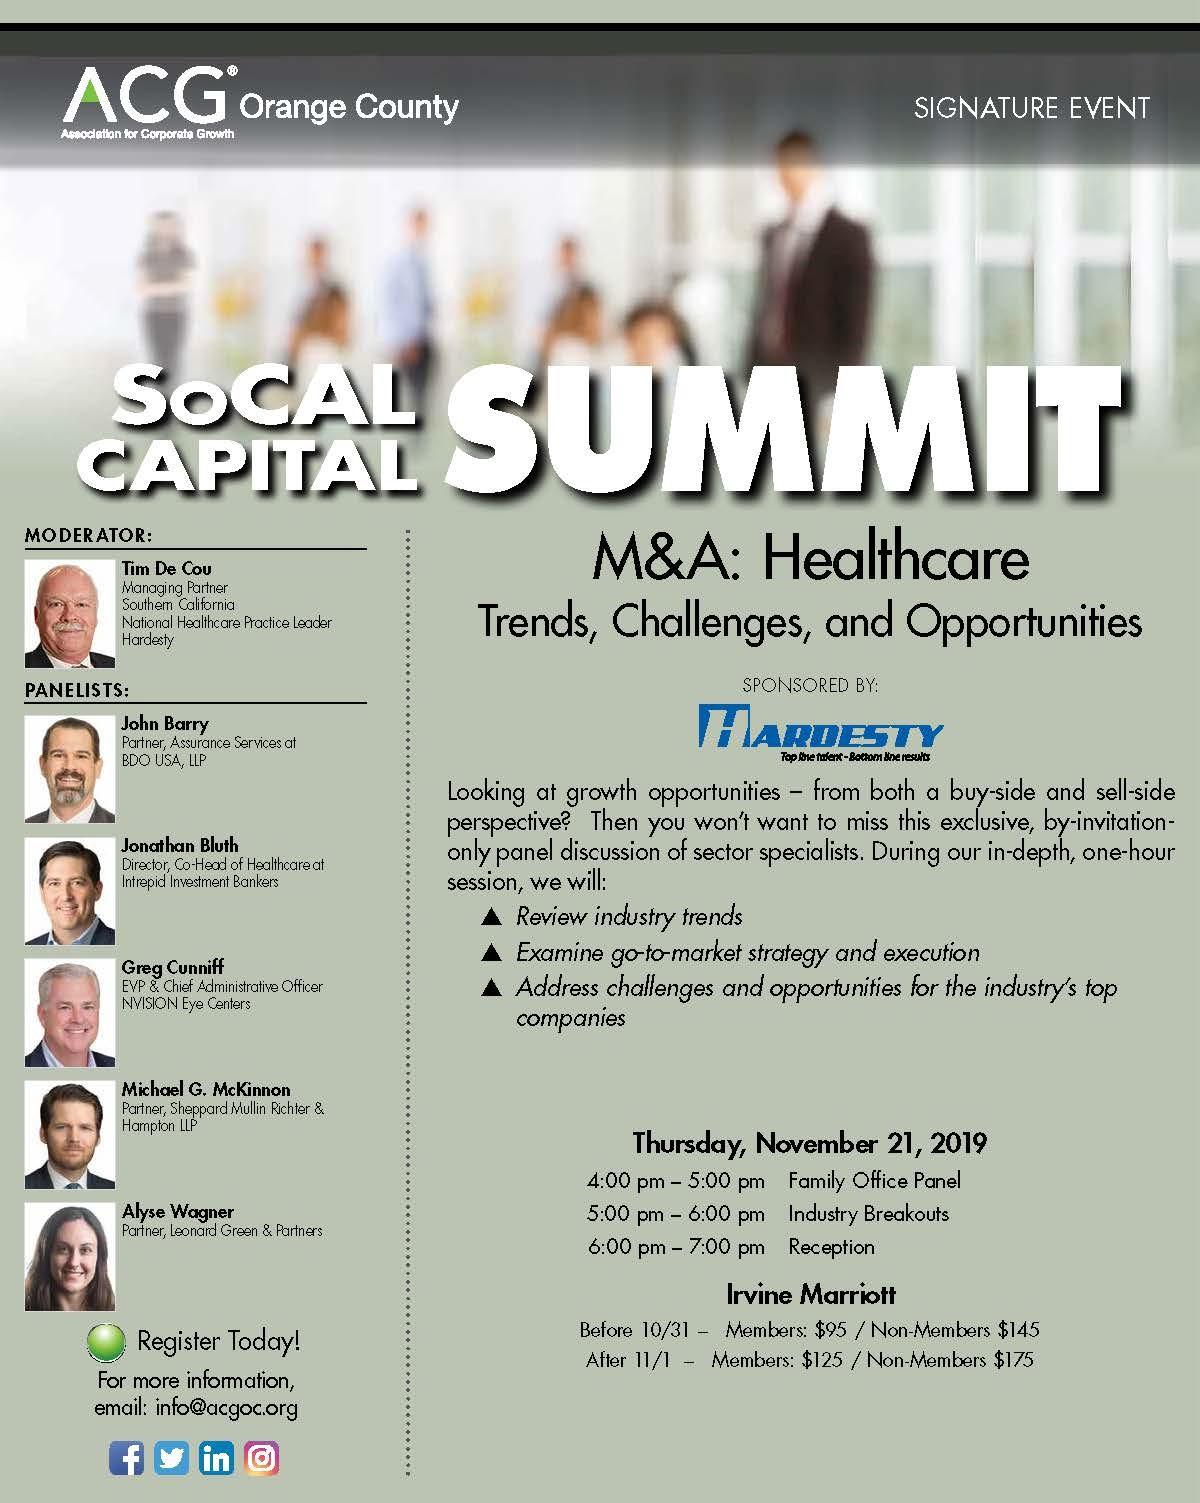 ACG OC SoCal Capital Summit